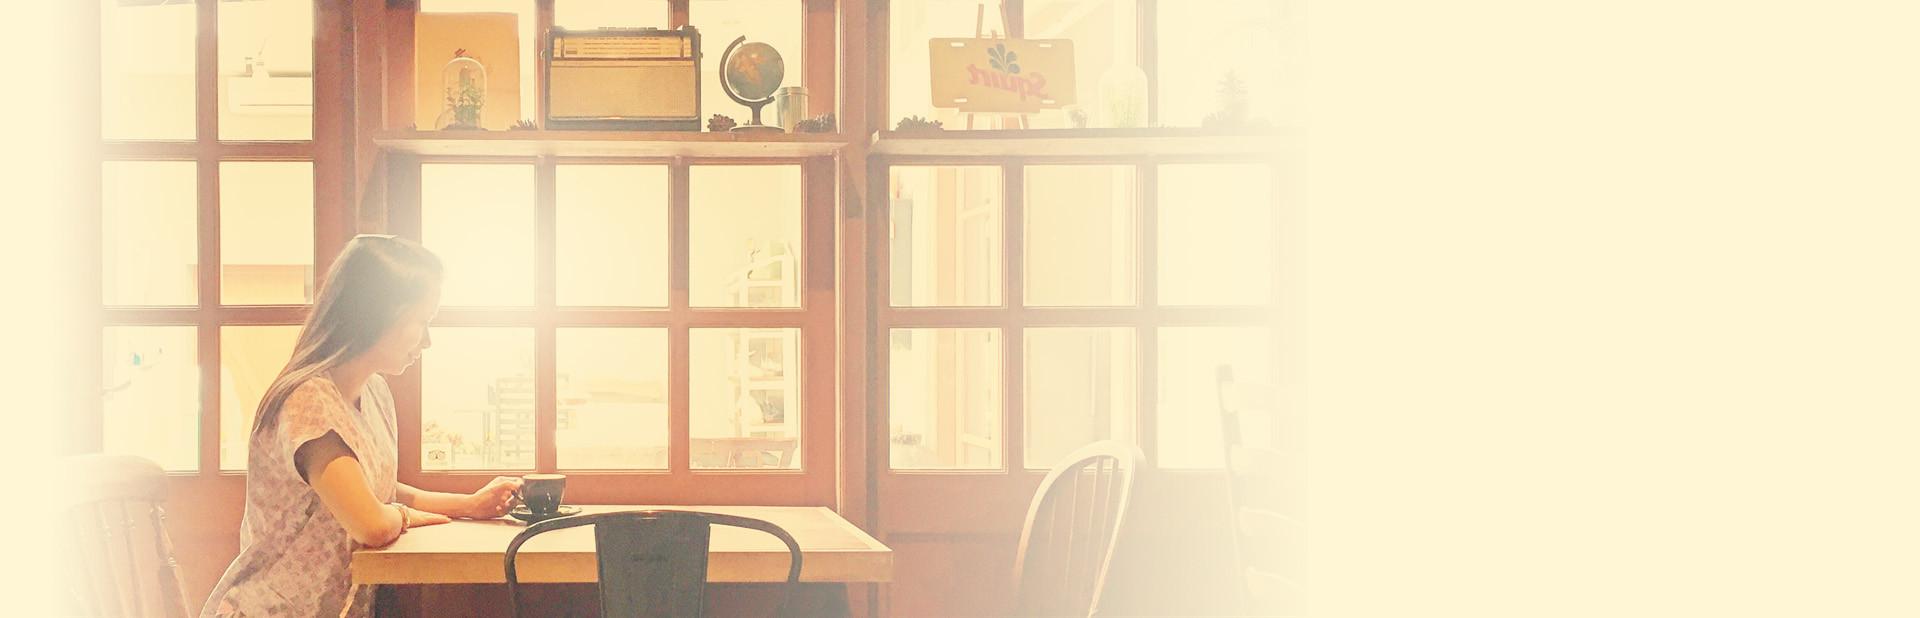 preflight 1920x618 - 01a